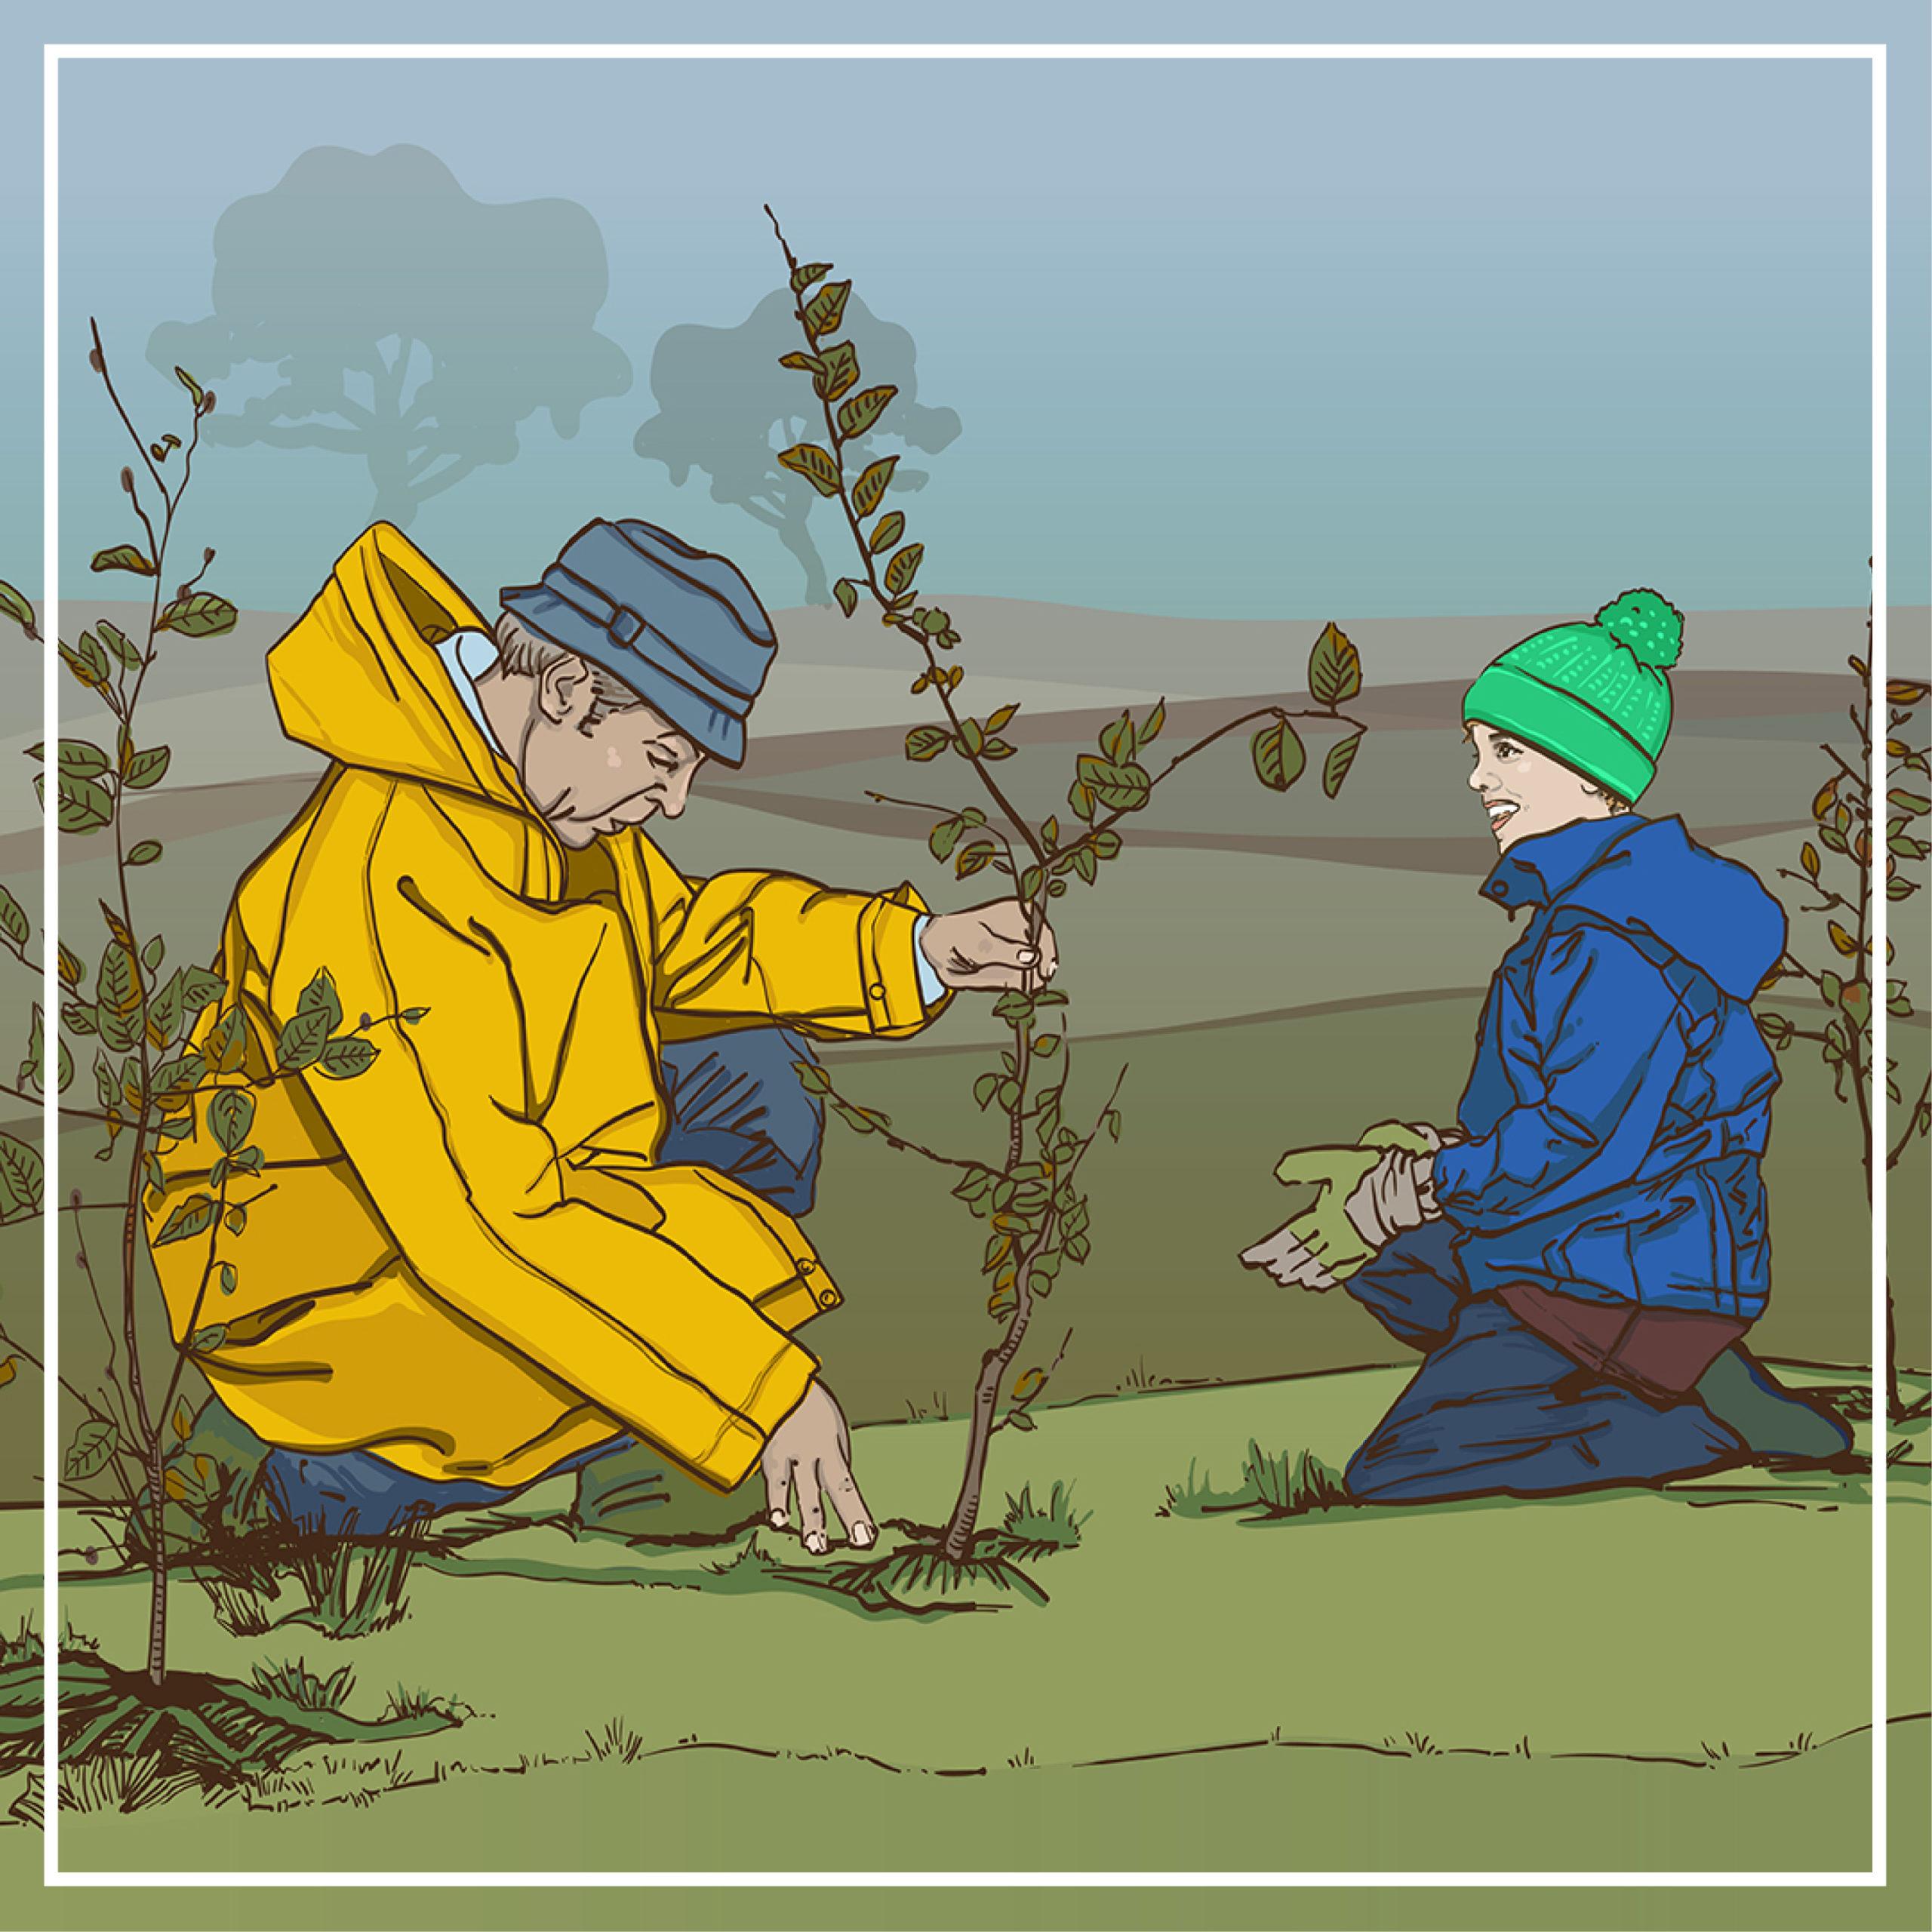 Sharepics: Animierte Illustrationen für den BUND e.V.